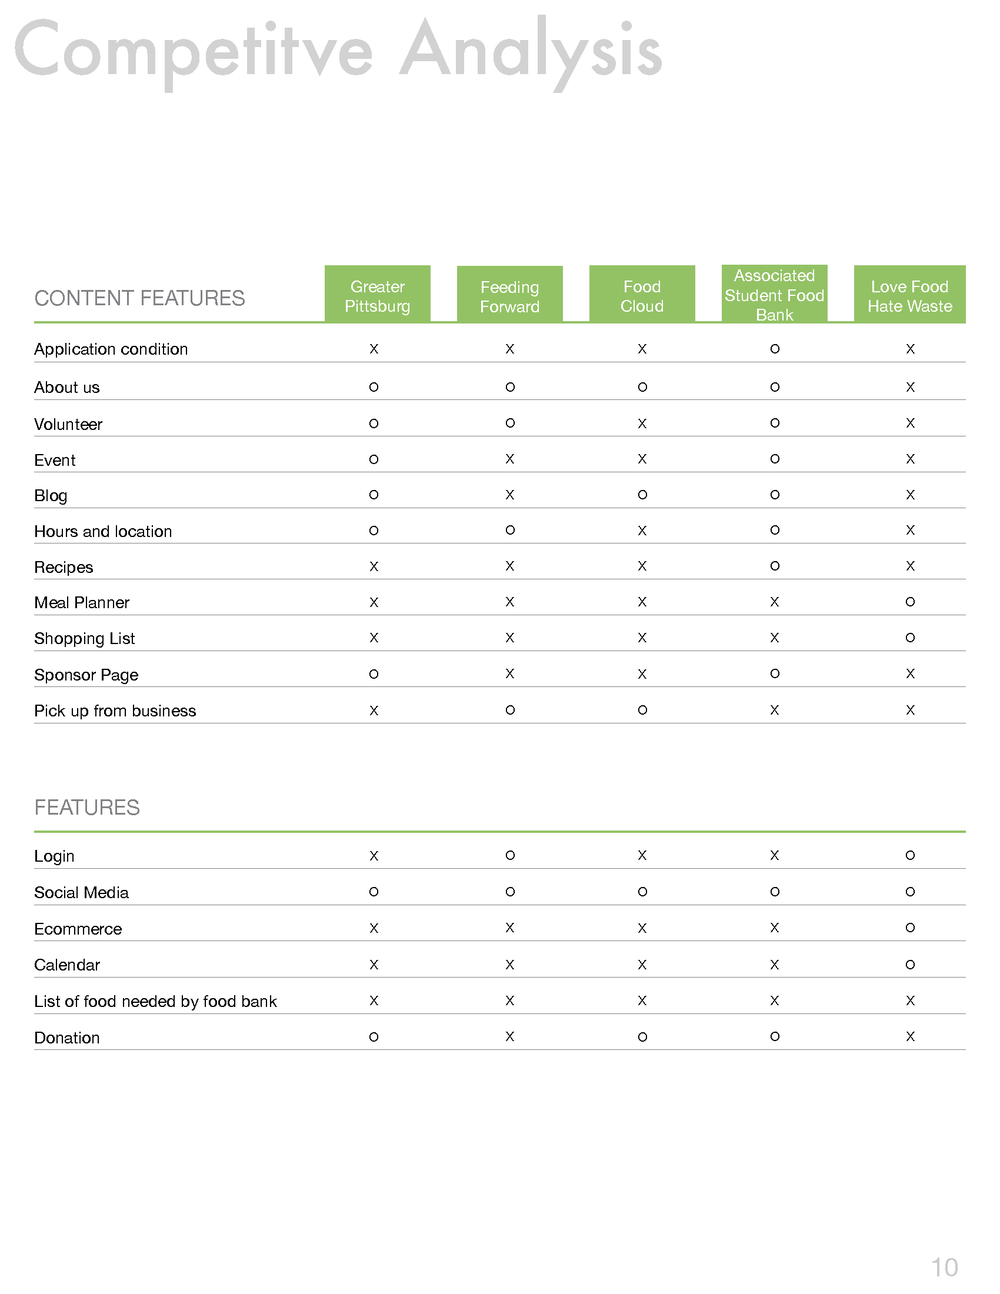 UX food bank app_Page_10.png